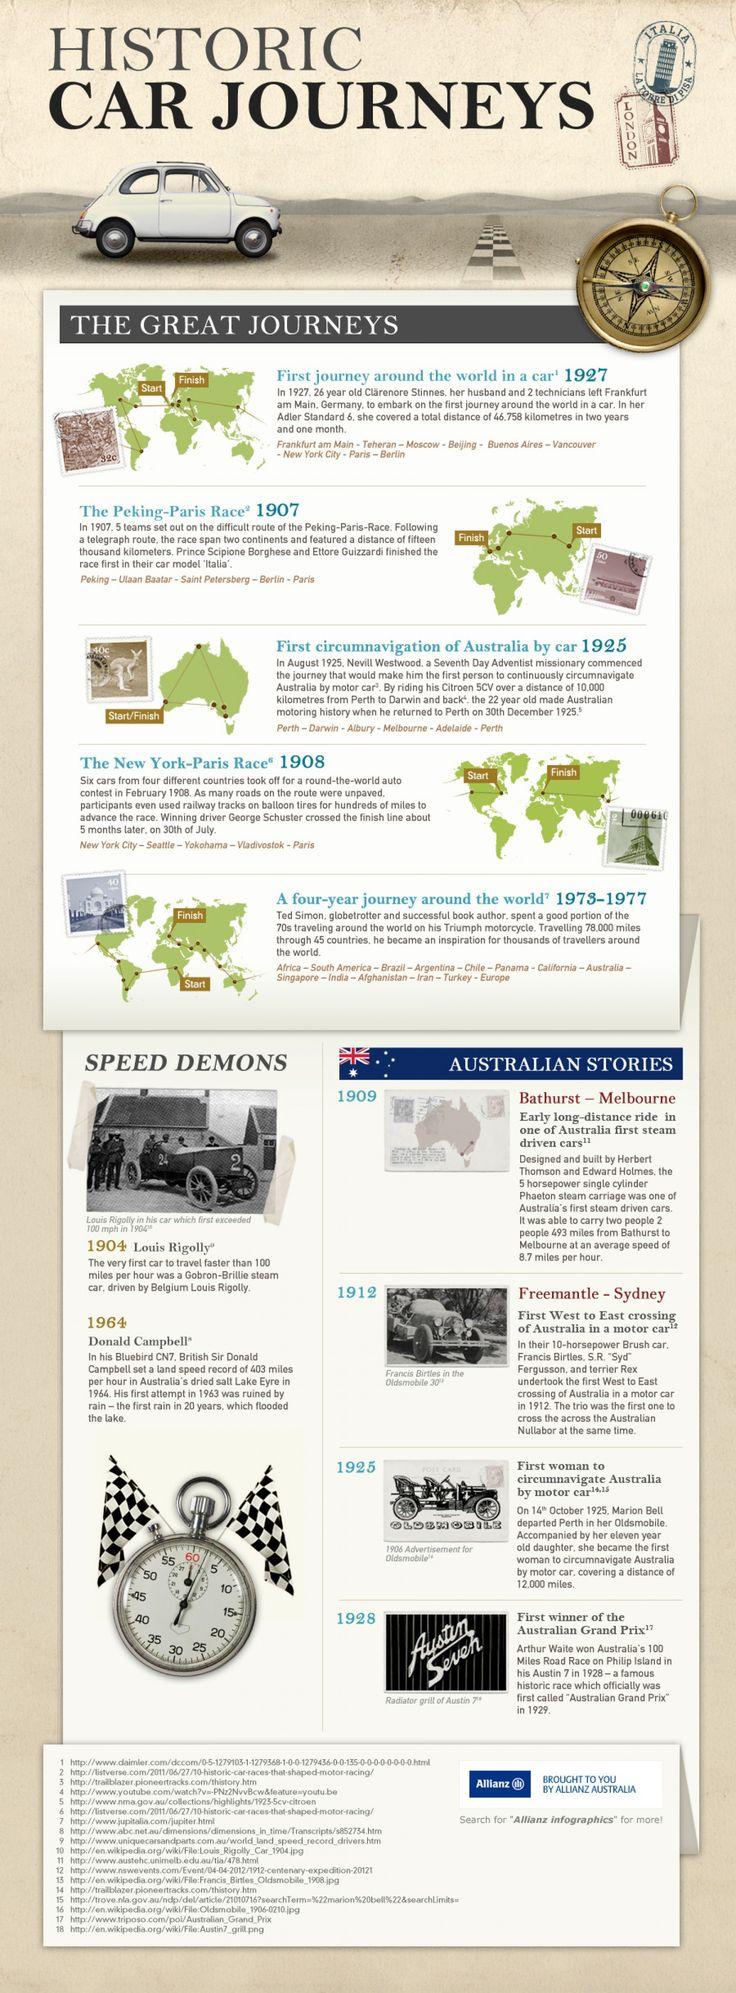 Historic Car Journeys